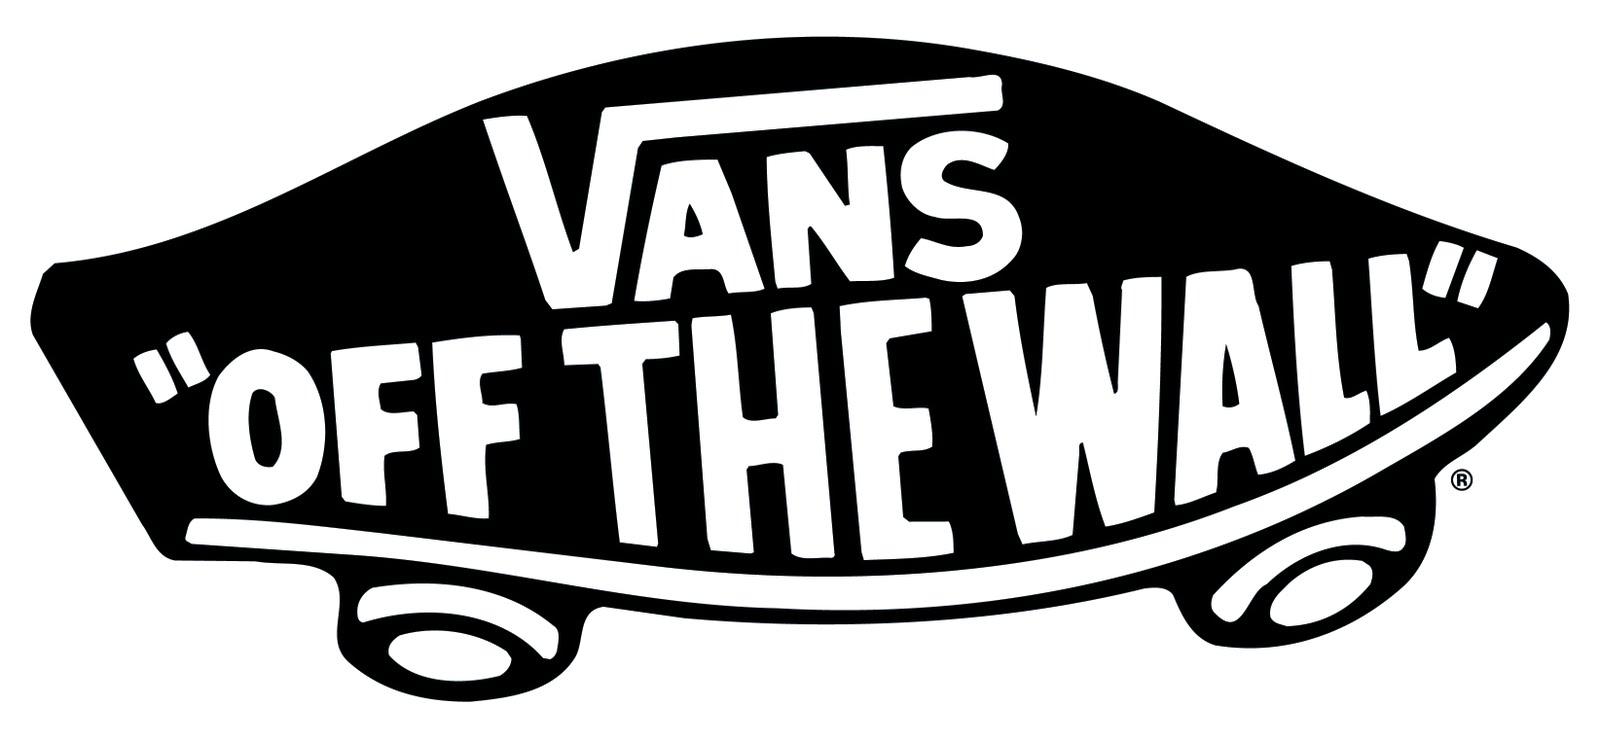 Free Vans Shoes Cliparts, Download Free Clip Art, Free Clip.